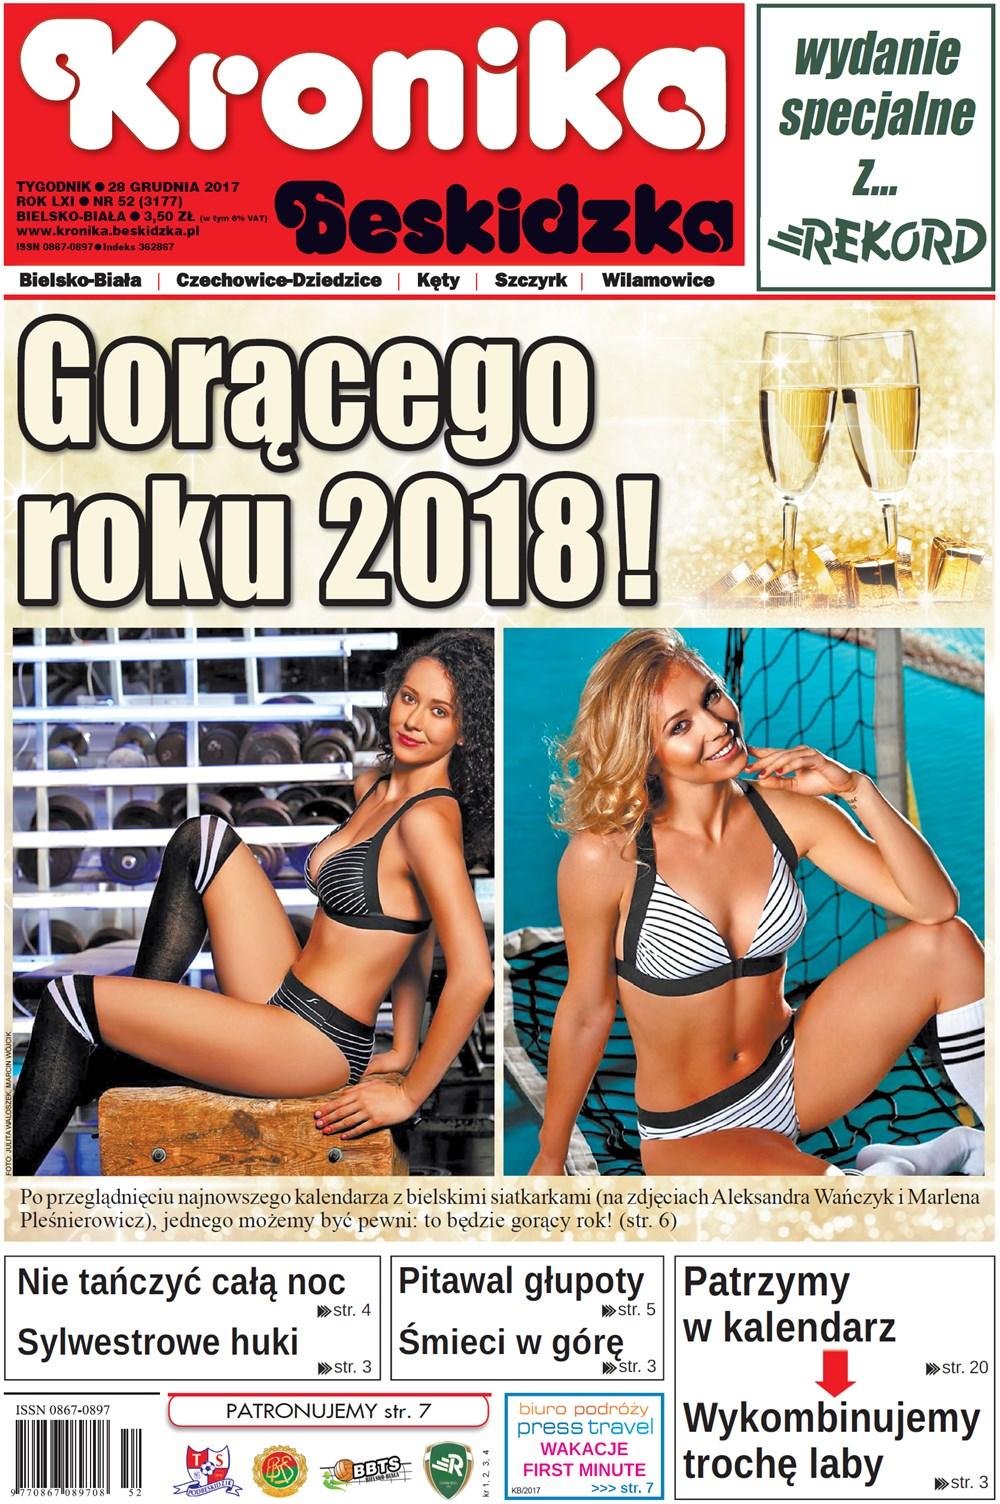 Kronika Beskidzka - tygodnik - prenumerata kwartalna już od 3,90 zł